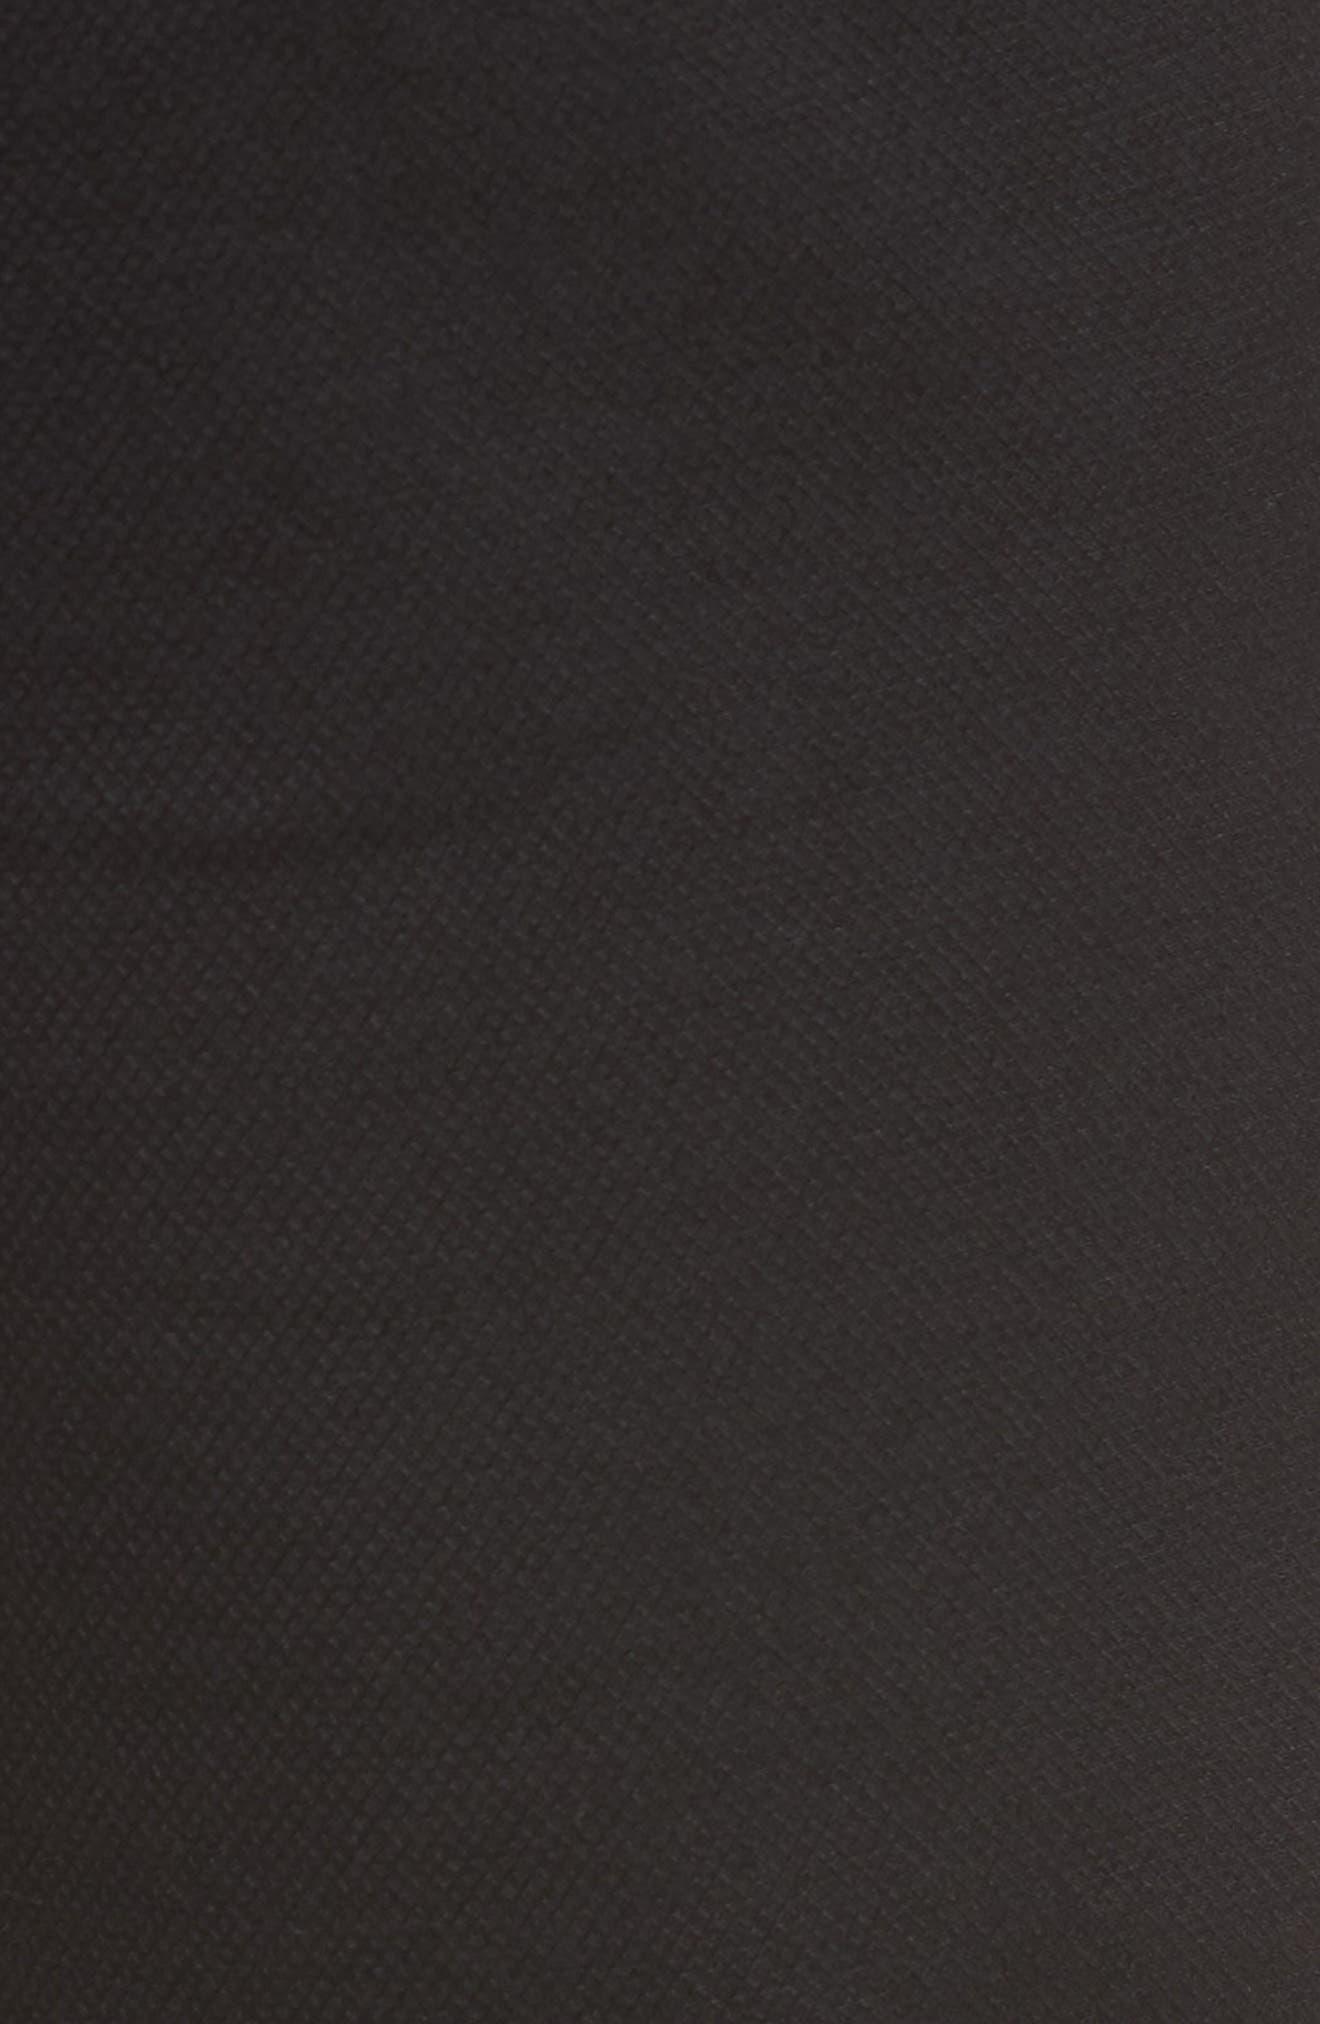 Woolook Diamond Slim Fit Pants,                             Alternate thumbnail 5, color,                             BLACK